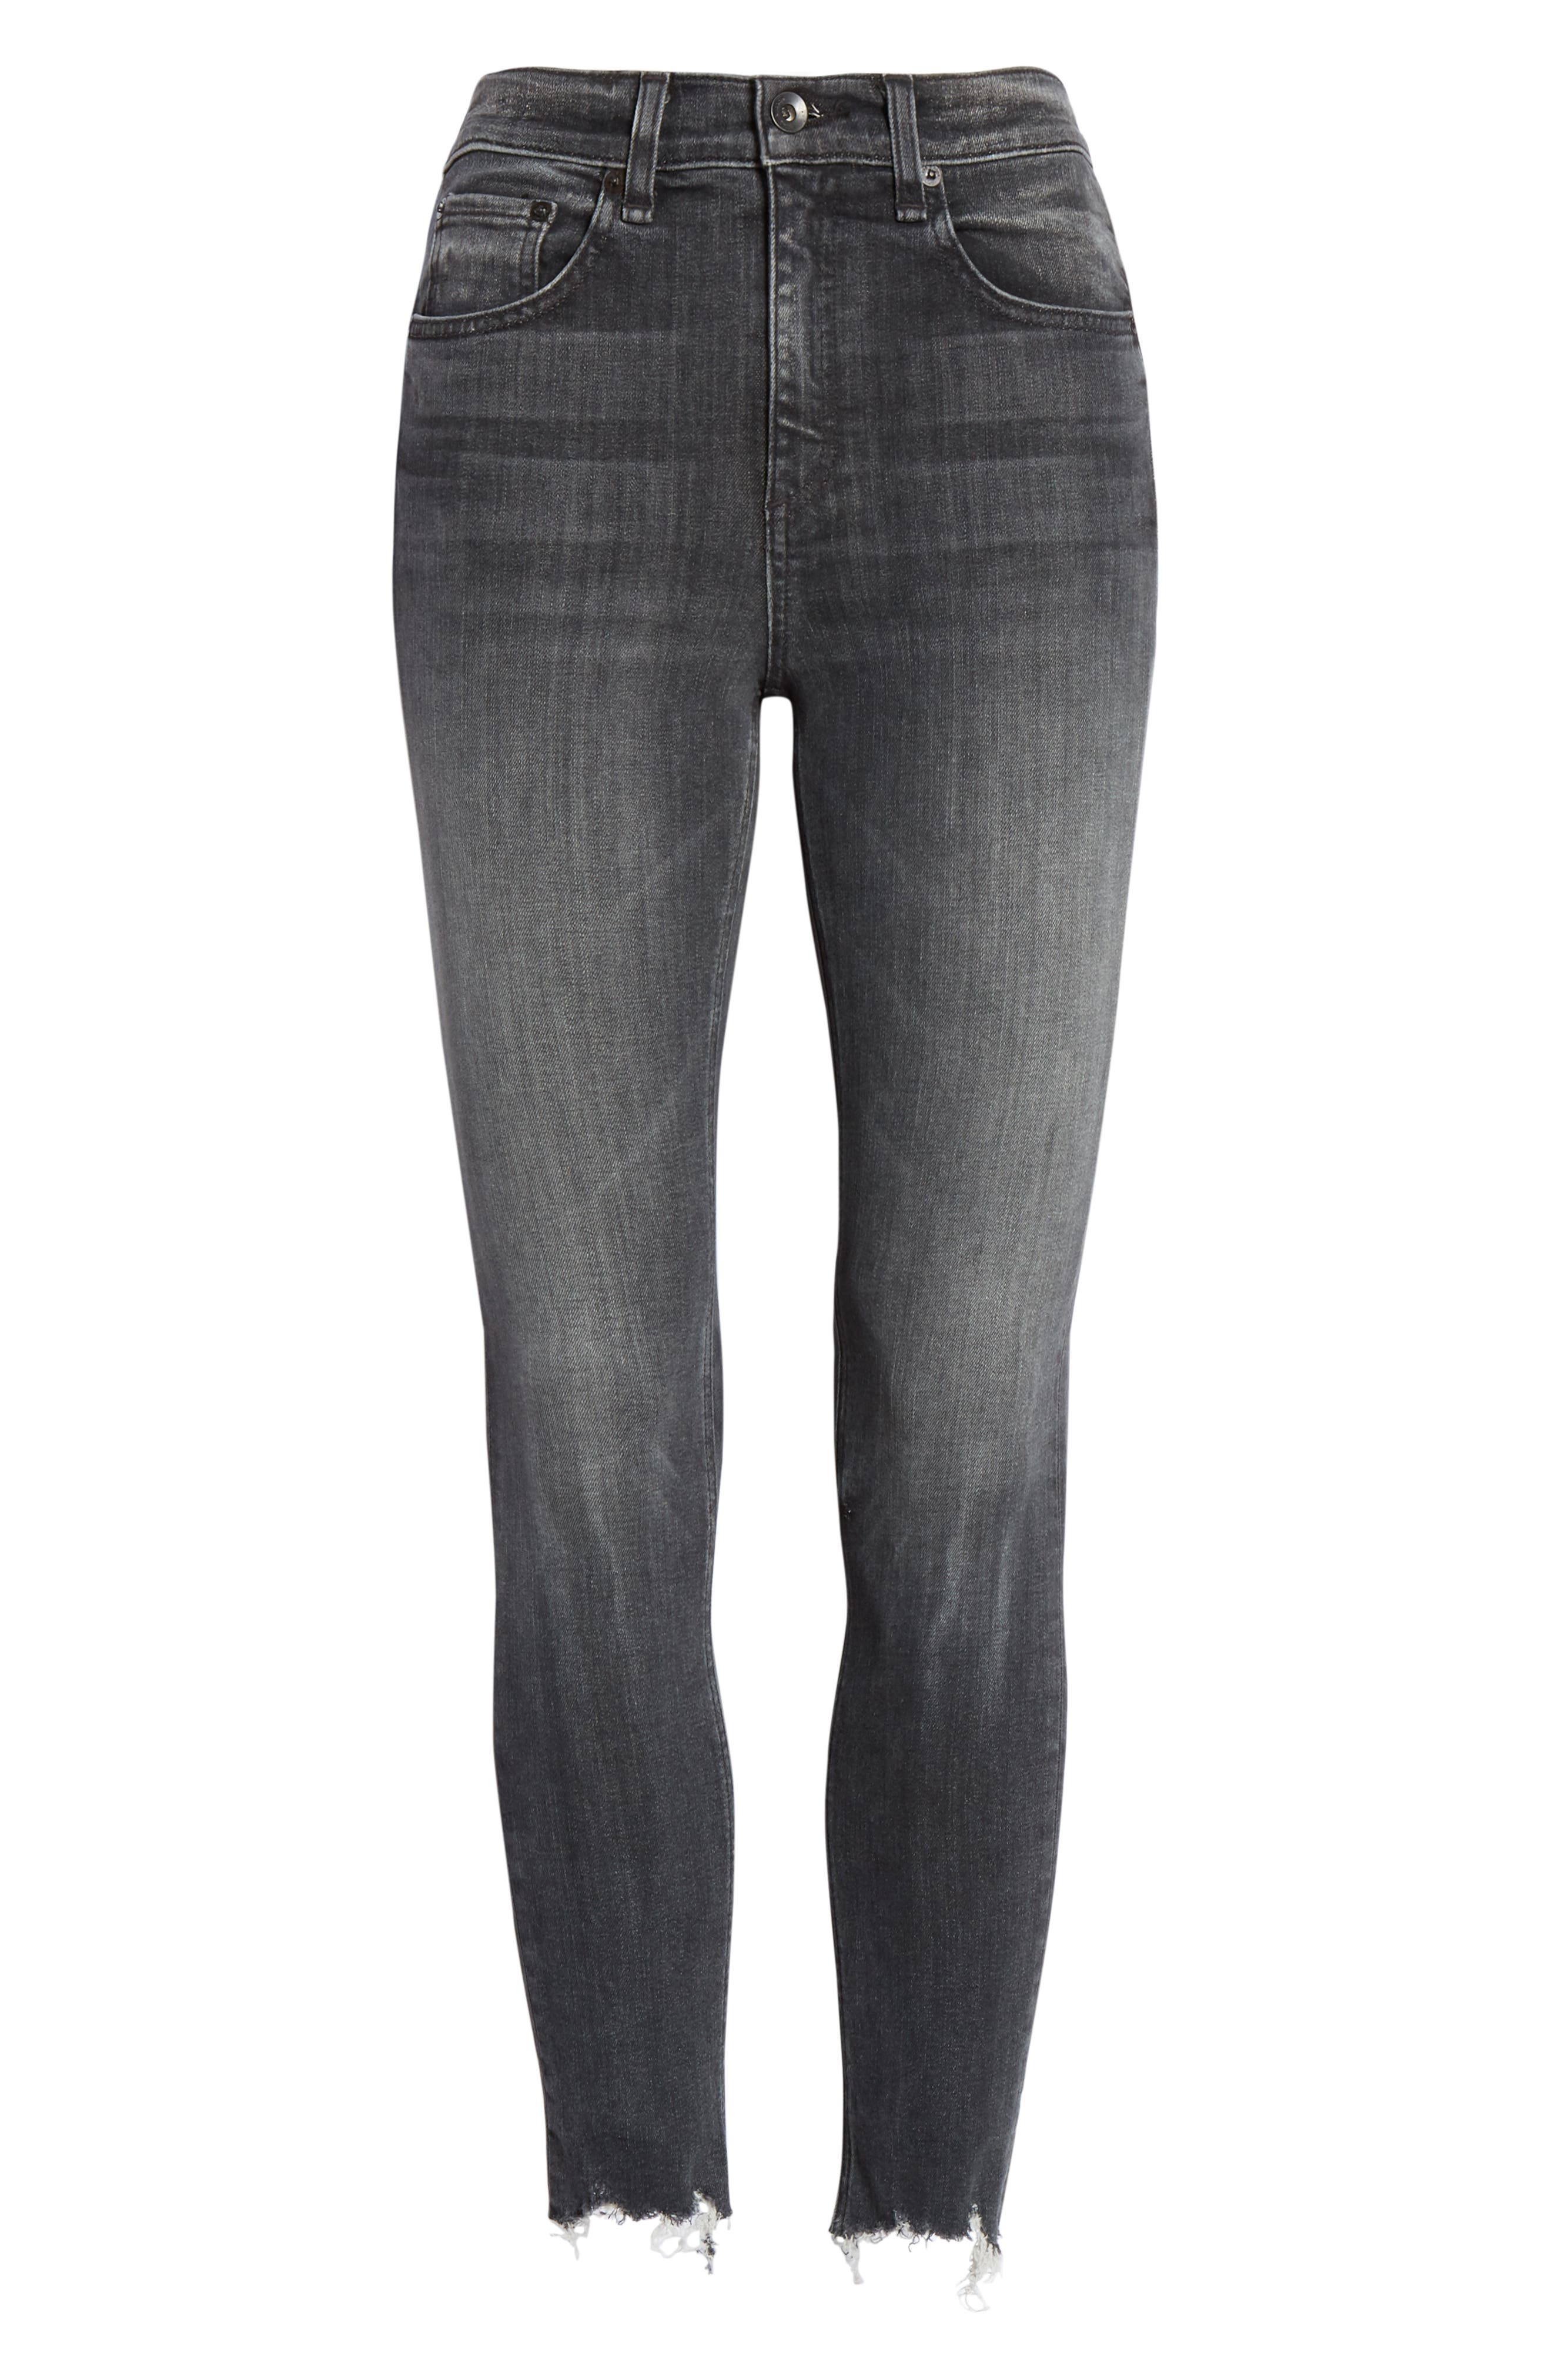 RAG & BONE, High Waist Raw Hem Crop Skinny Jeans, Alternate thumbnail 6, color, BRANDI